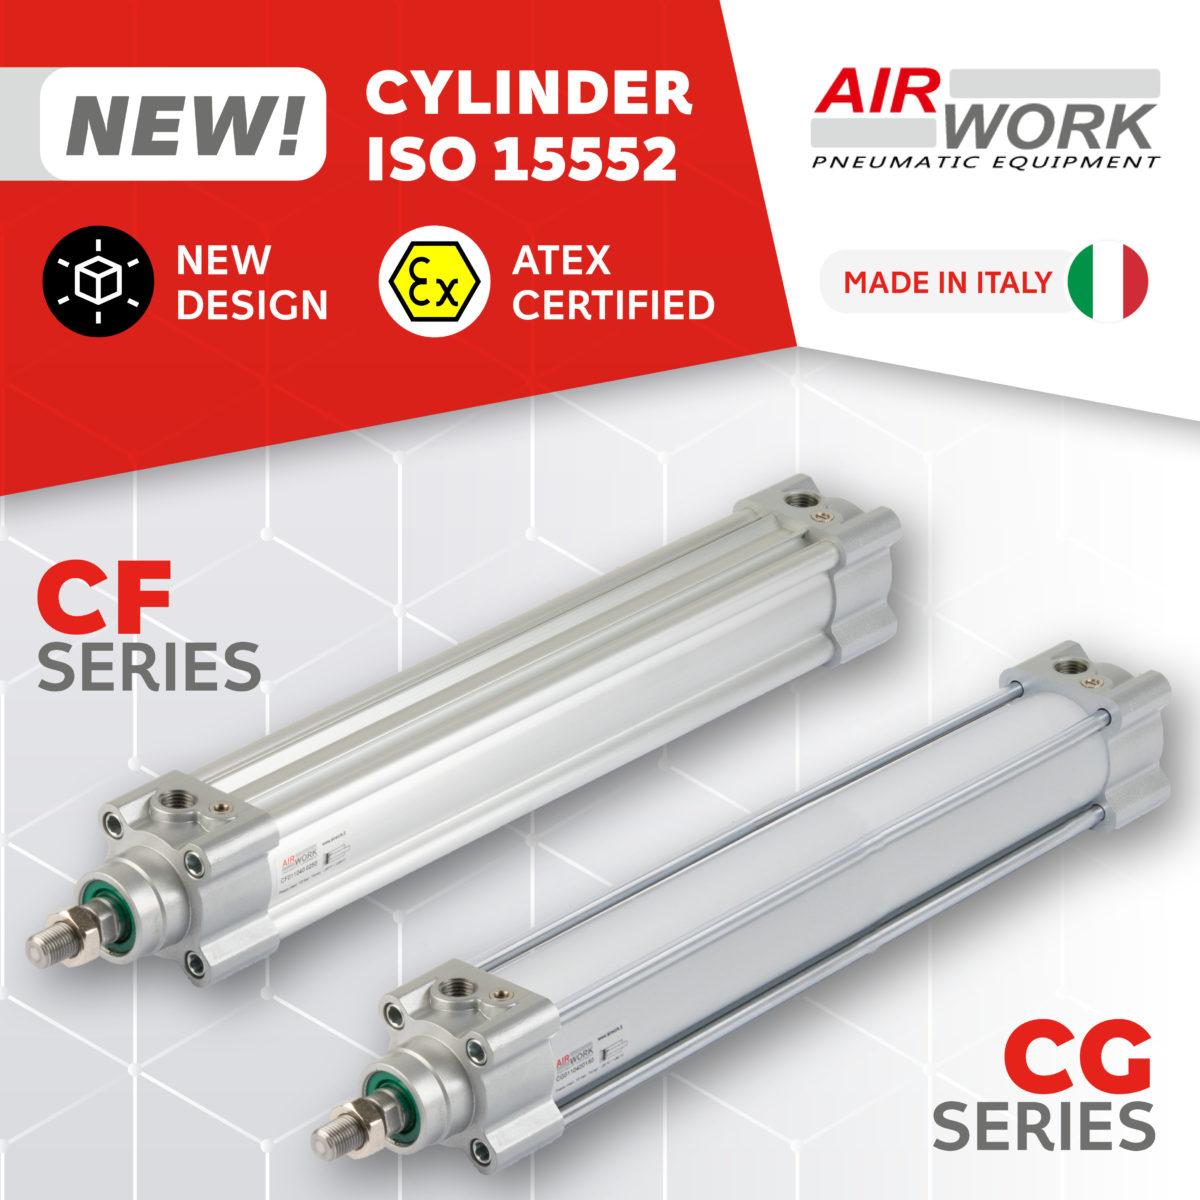 CF CG Pneumatic Cylinders ISO 15552 Airwork